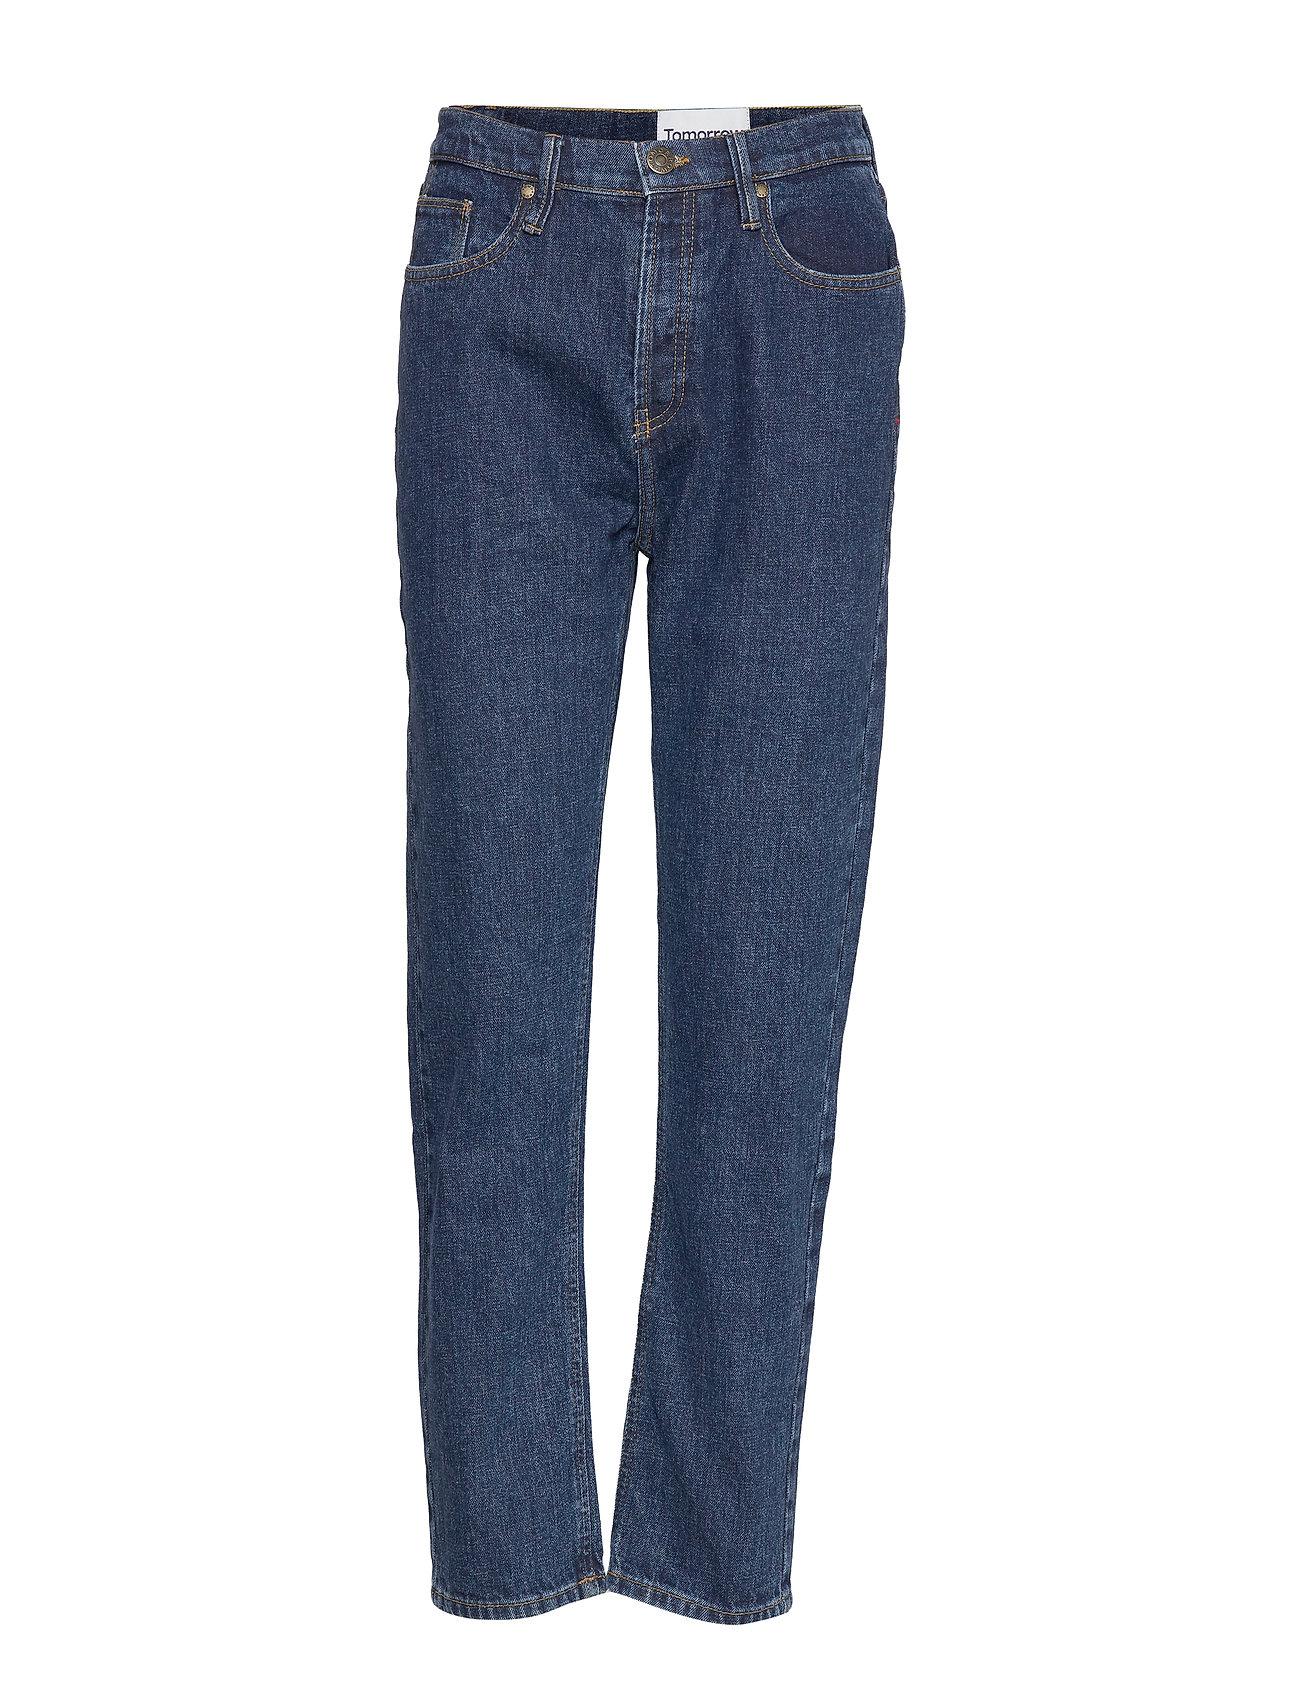 Tomorrow Teresa regular jeans wash dark Orla - DENIM BLUE